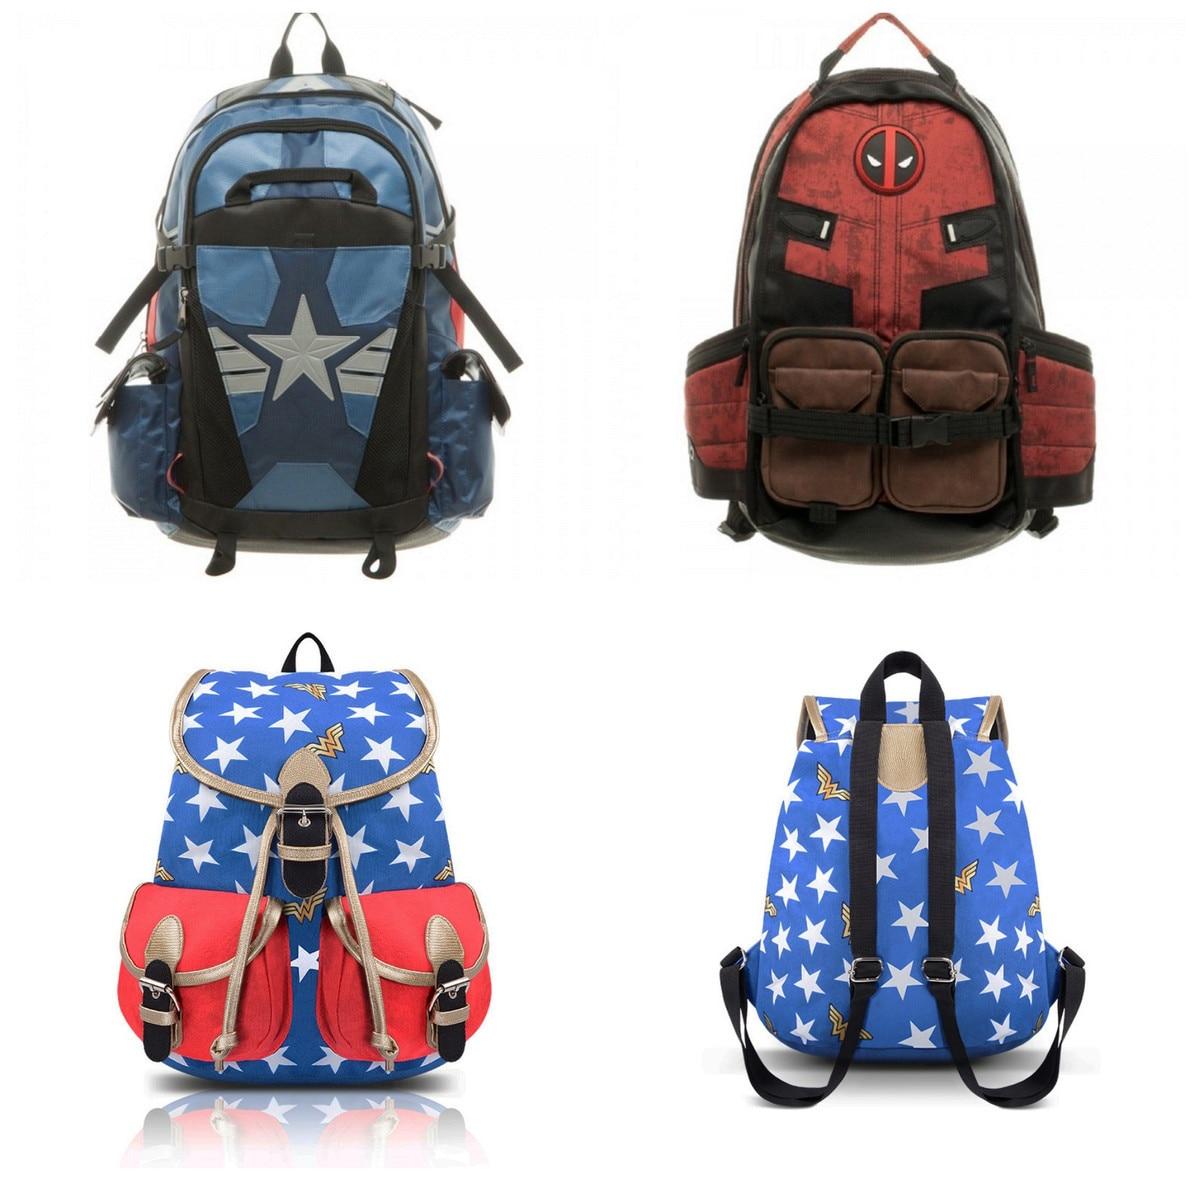 DC Comics Magical Woman Deadpool Captain America Backpack Birthday Gift Male Woman Package Knapsack School Travel Satchel